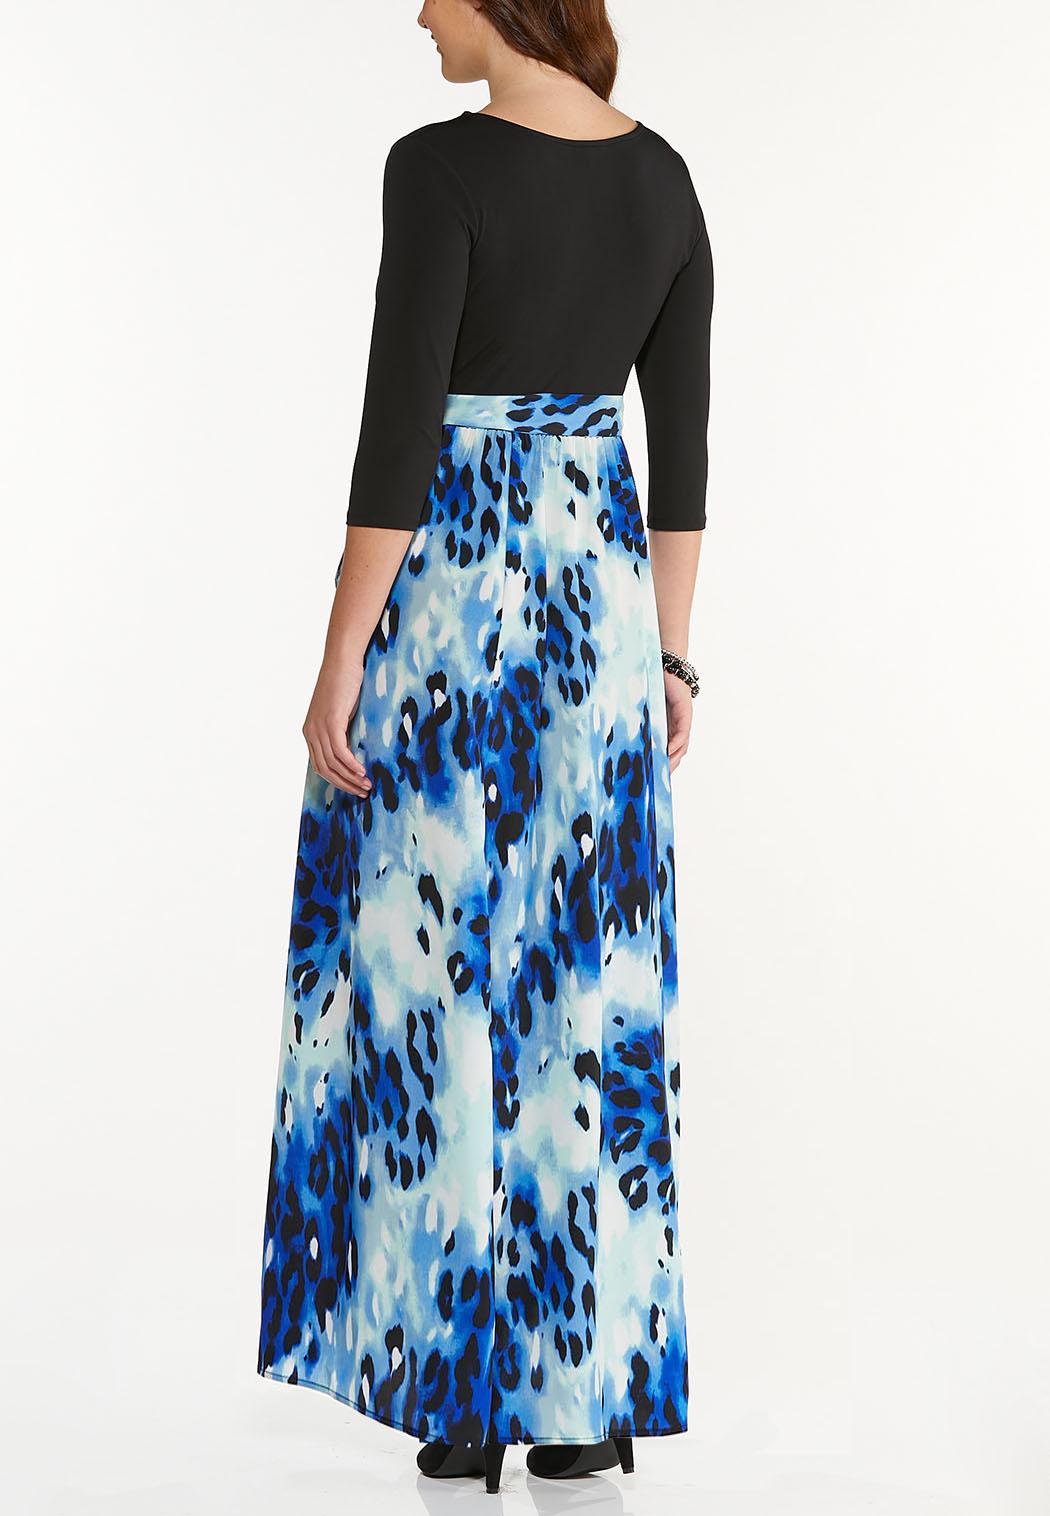 Petite Sky To Sea Maxi Dress (Item #44502980)